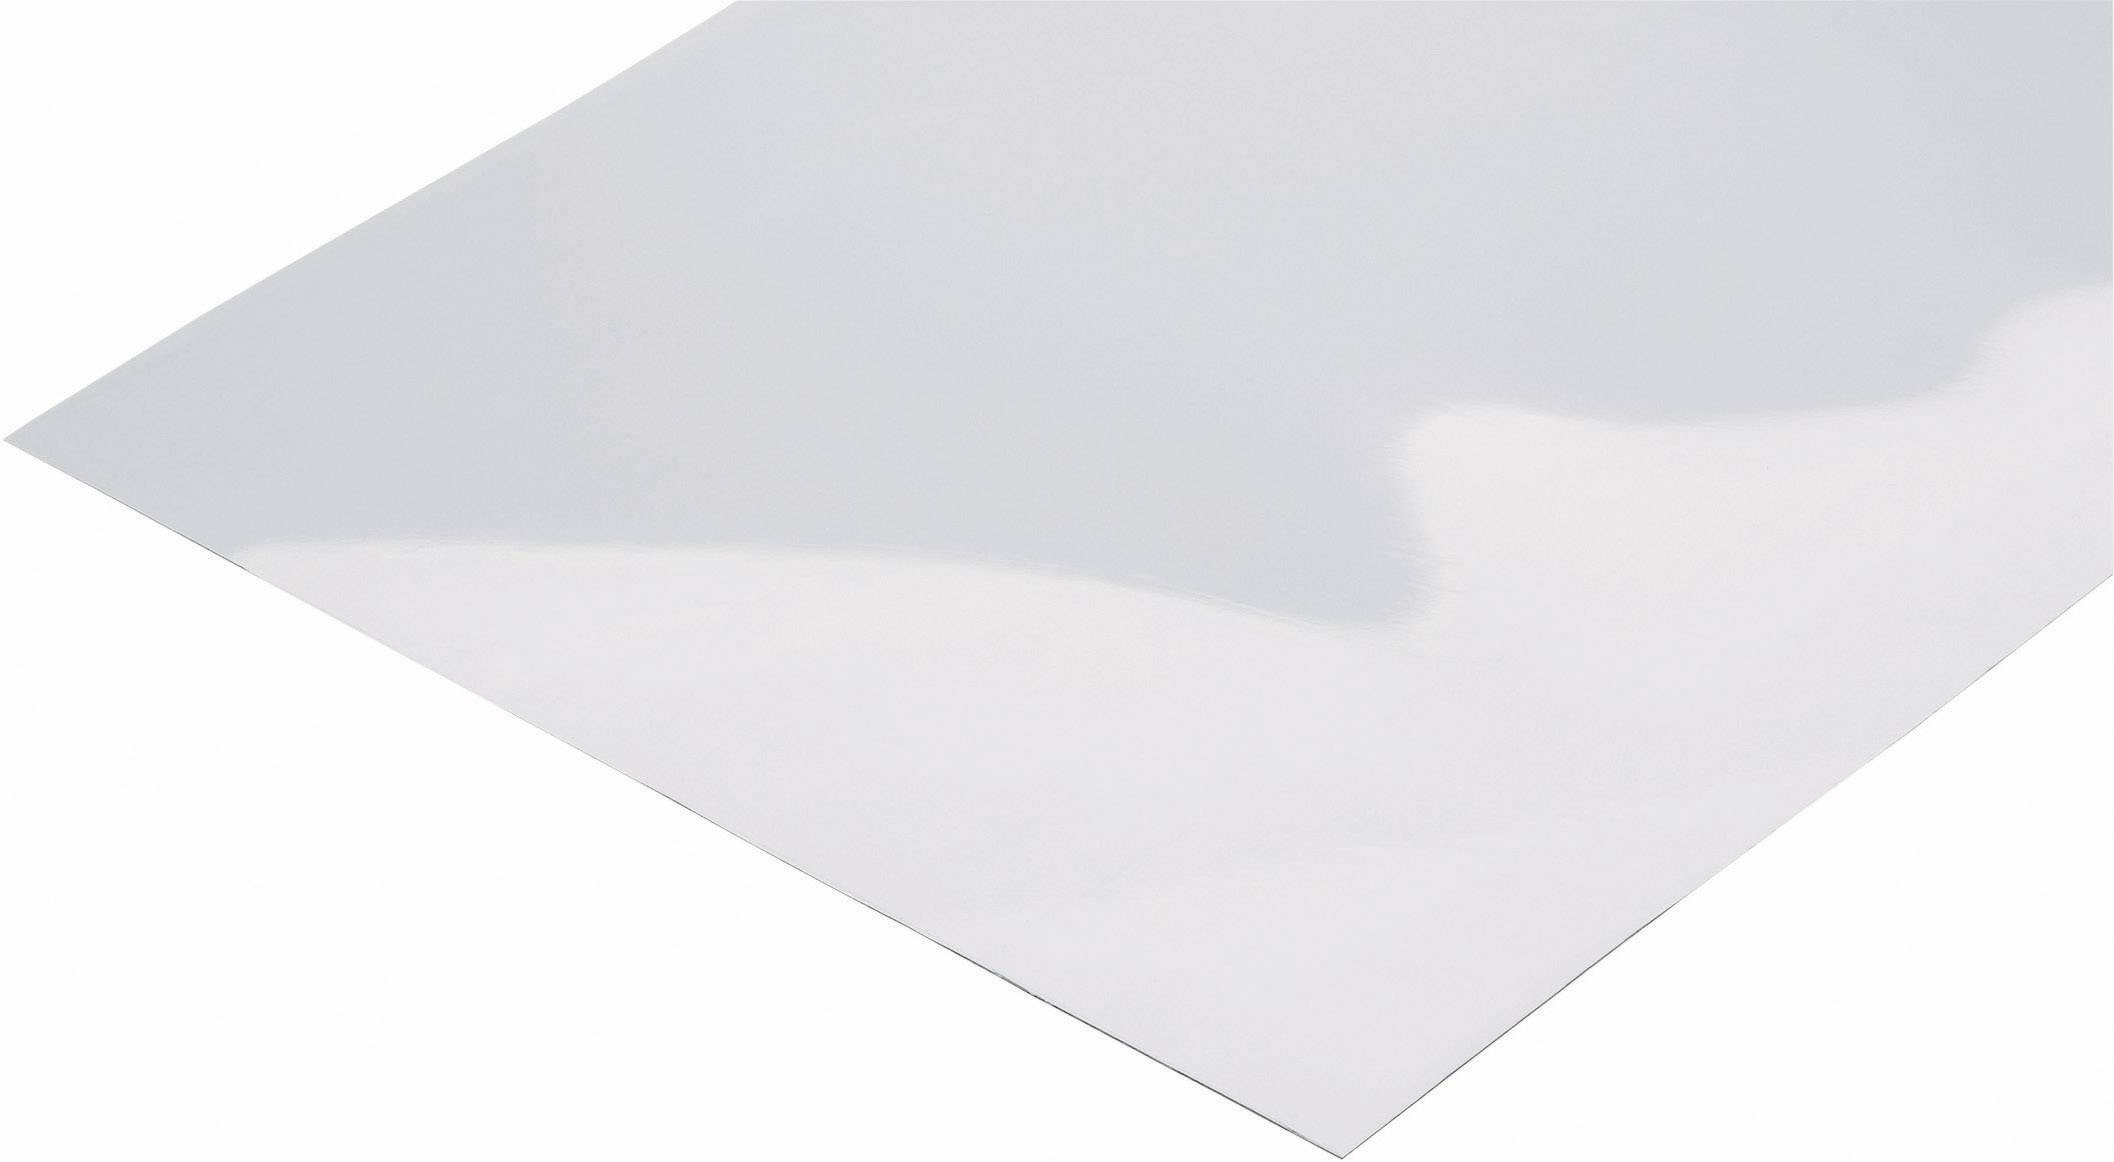 Polykarbonátová deska Modelcraft 400 x 500 x 2 mm